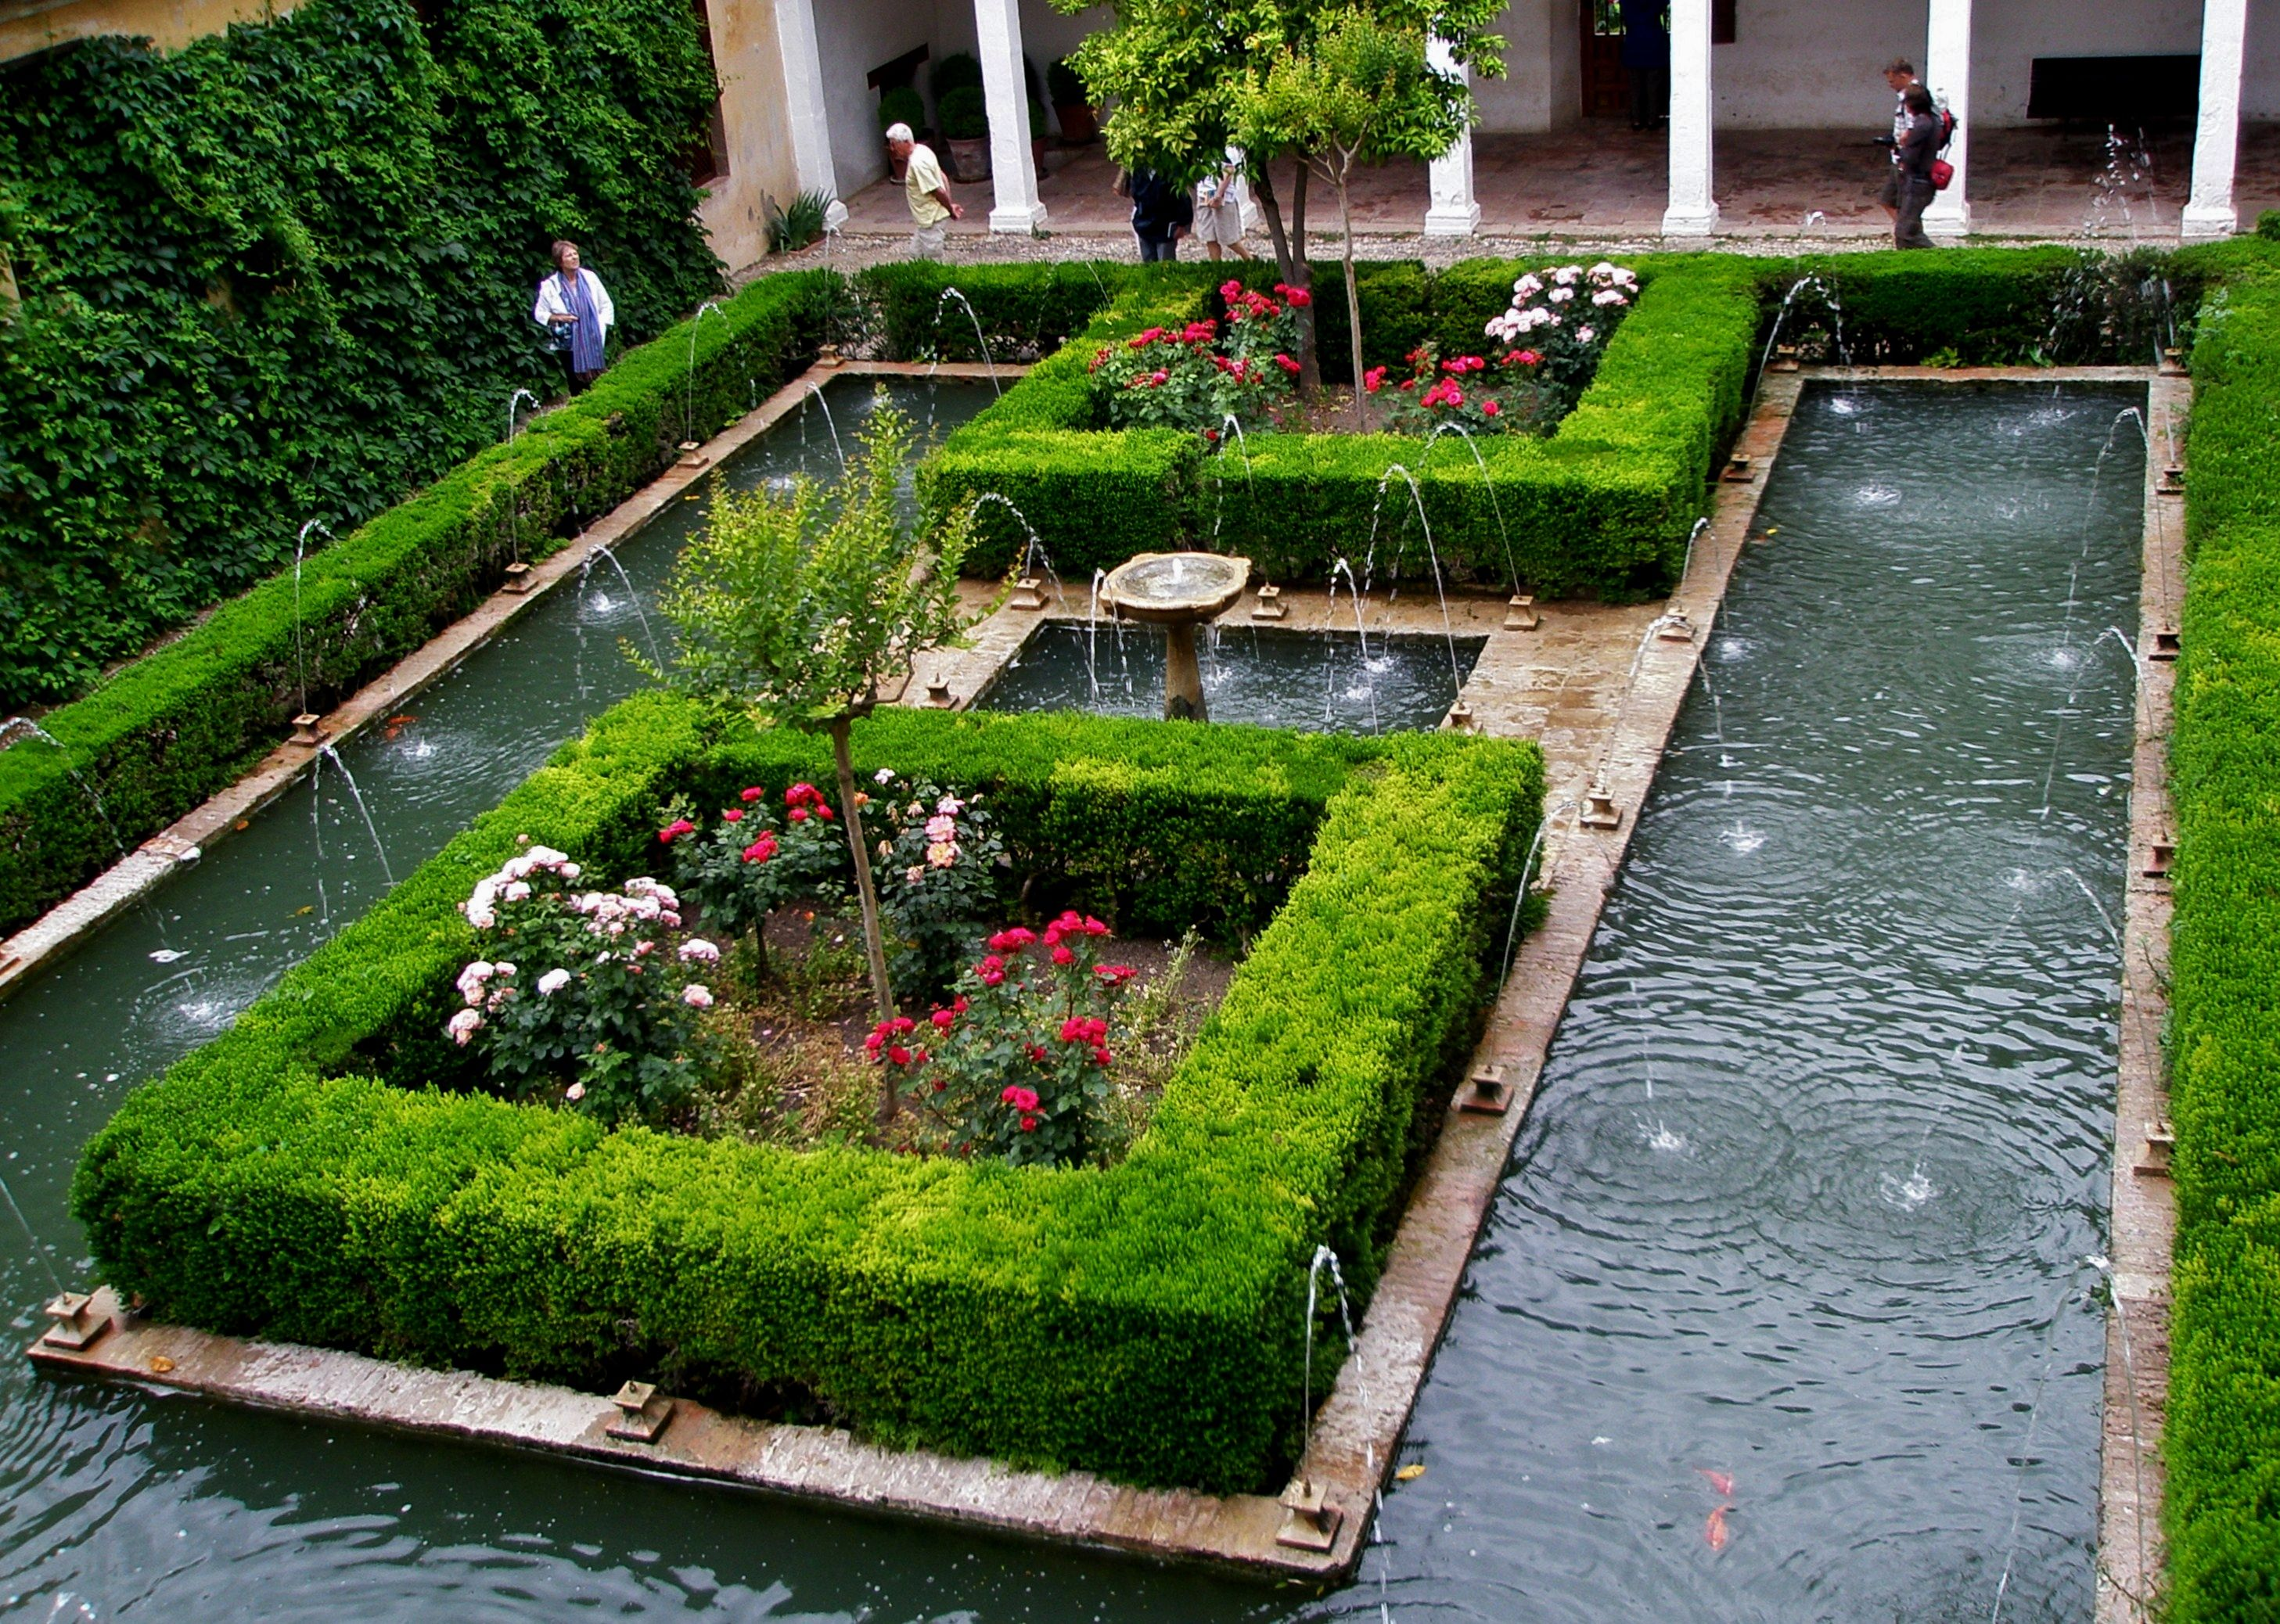 Alberca del generalife jardines arabes pinterest for Jardines generalife